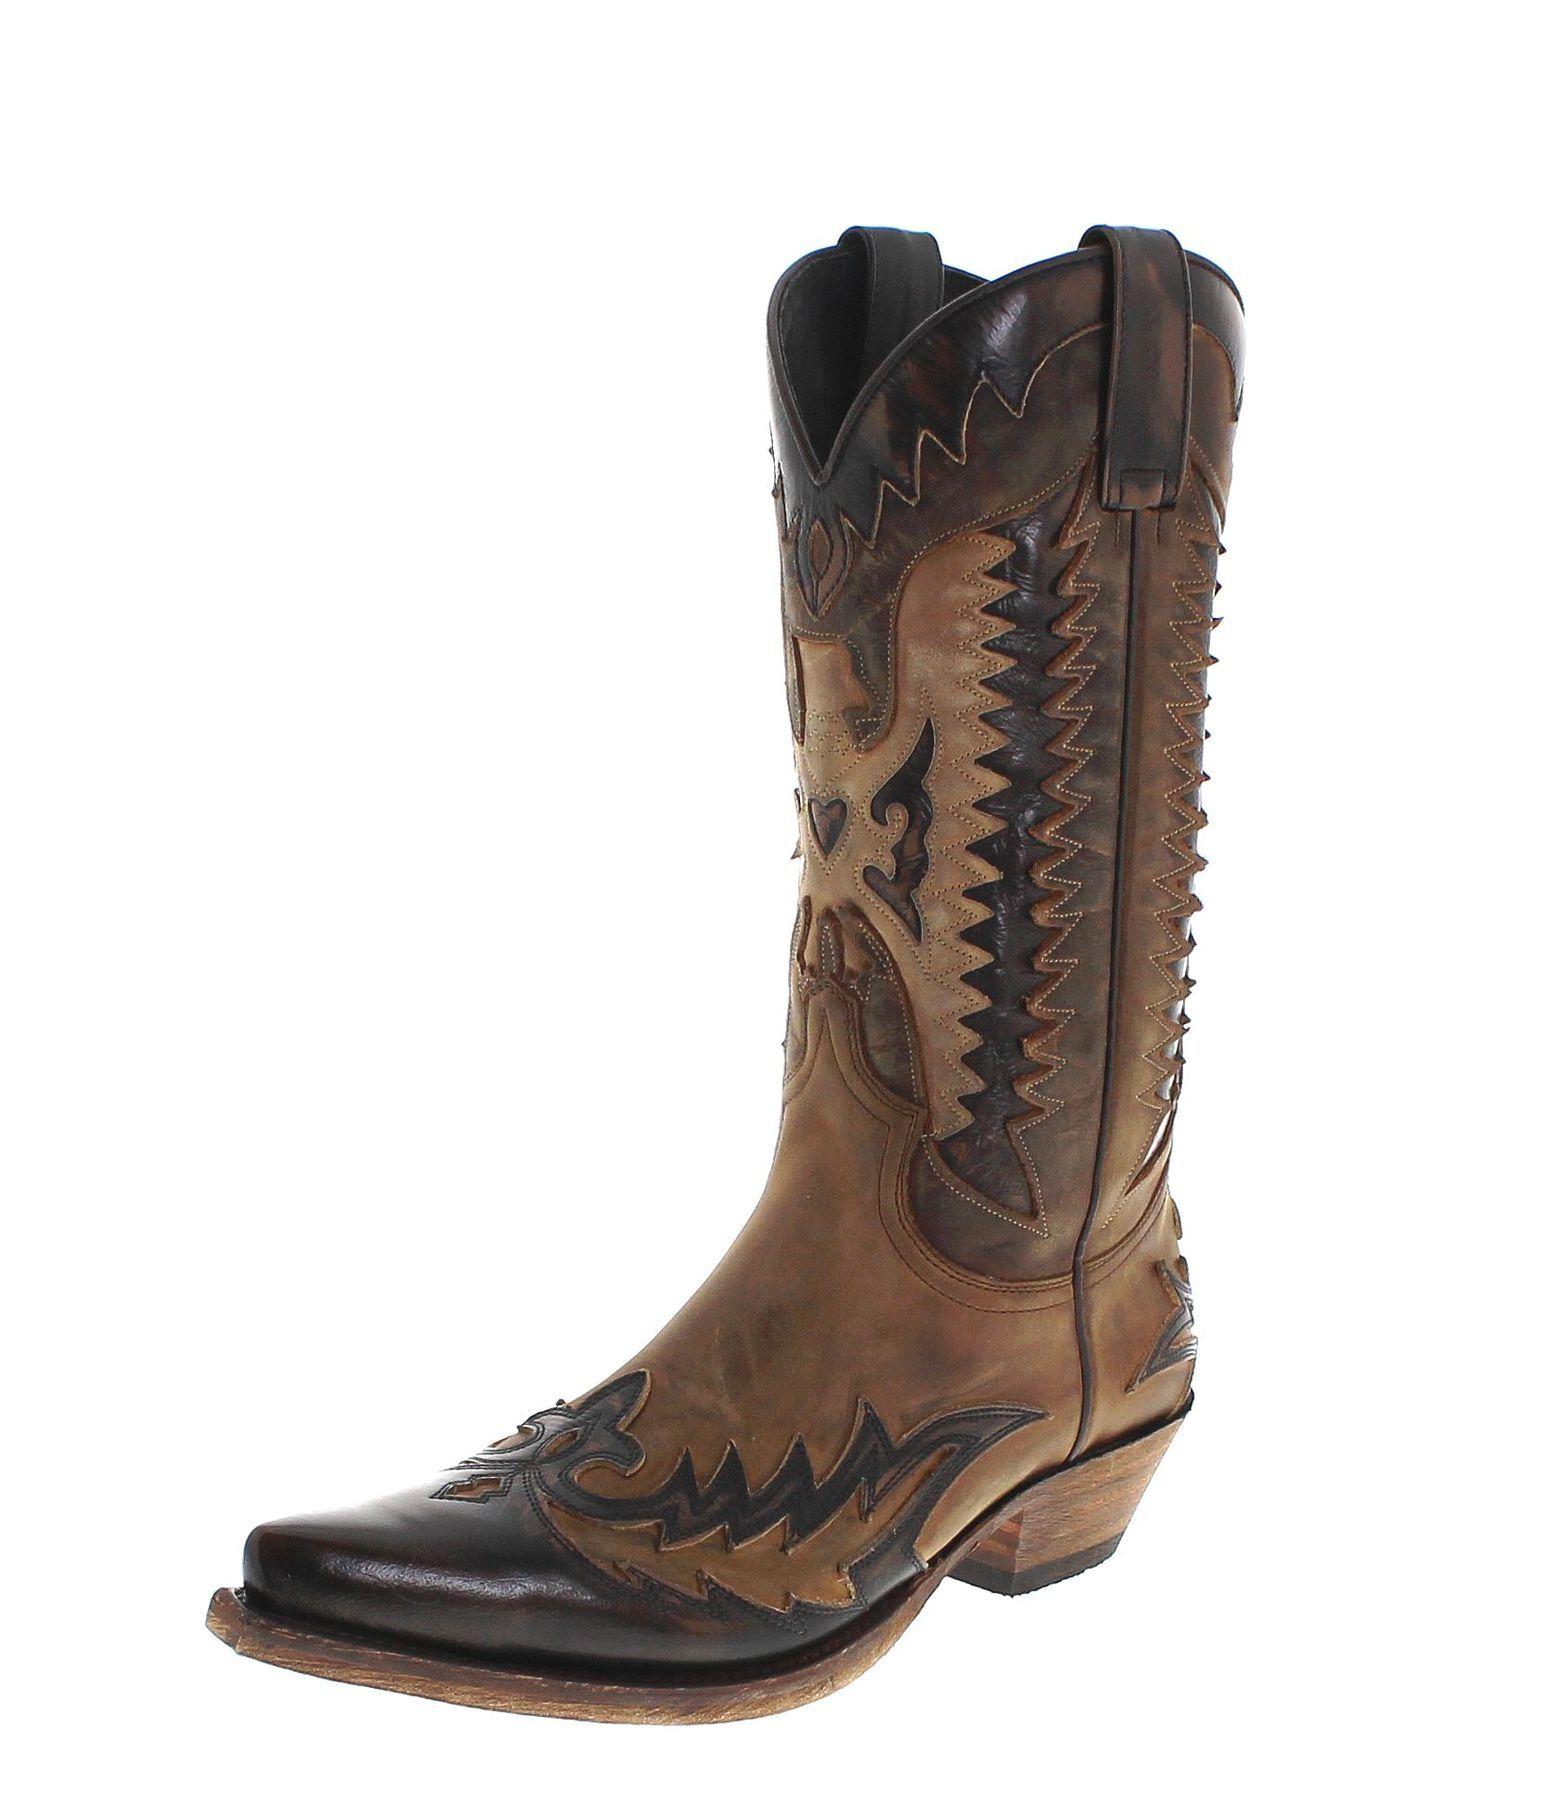 premium selection caa50 ac1ce Sendra Boots 13040 Mad Dog Tang Lavado Herren Cowboystiefel ...